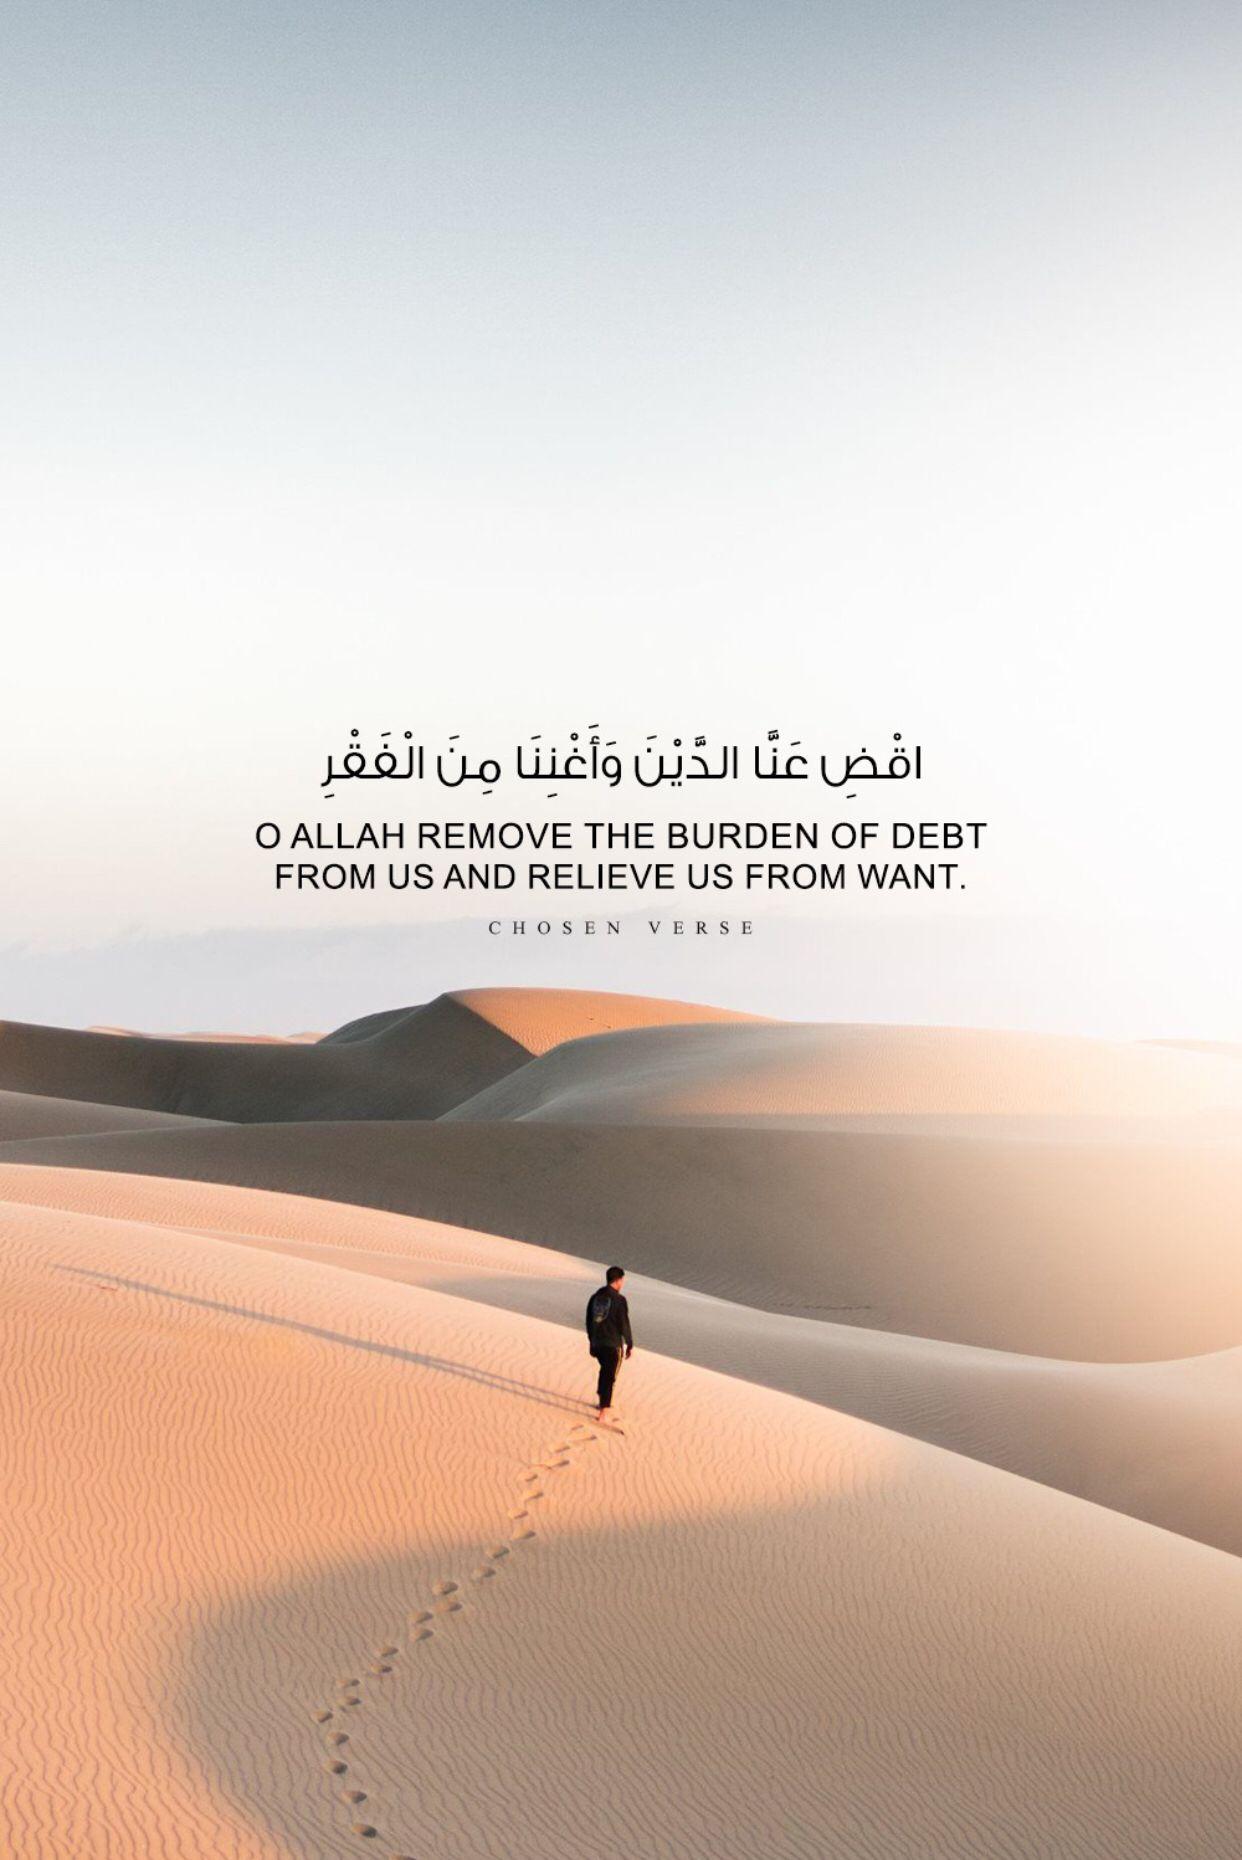 Pin By Fahad Baloch On Quran Verses Islamic Quotes Beautiful Islamic Quotes Islamic Teachings Quran Verses